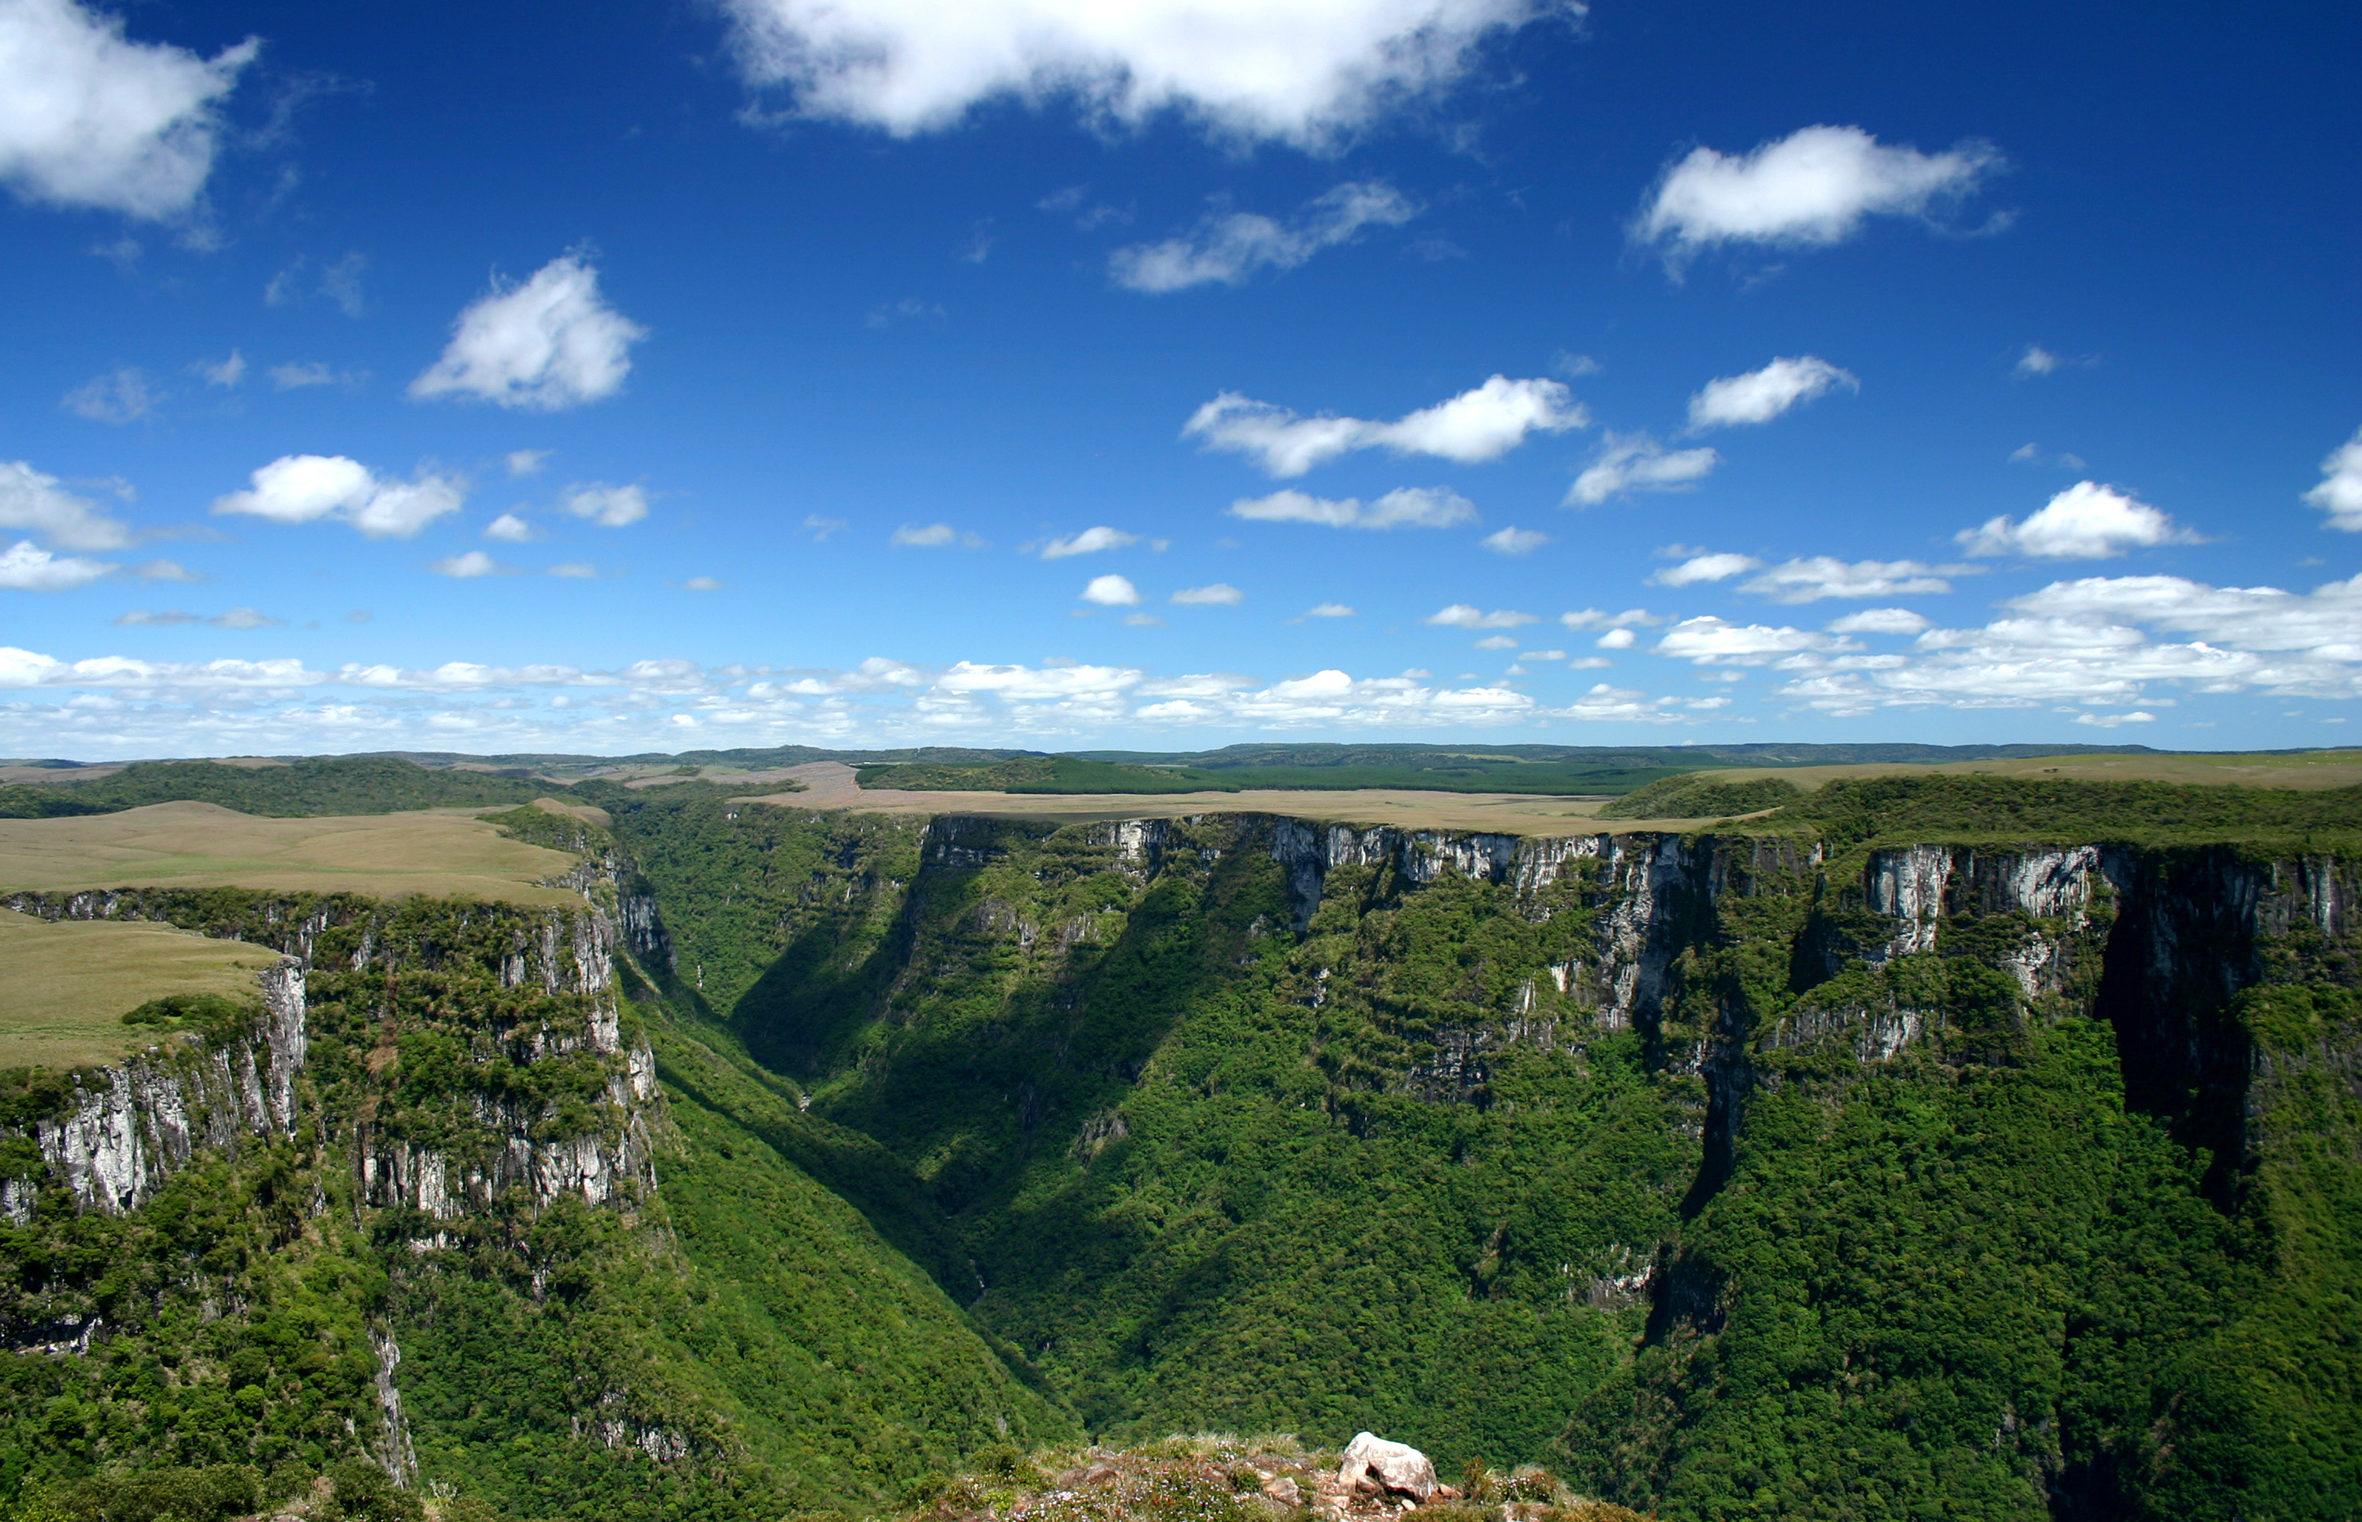 Parador Crédito Edison Vara 145 e1478011975649 - 5 parques nacionais brasileiros para os amantes da natureza. Conheça!